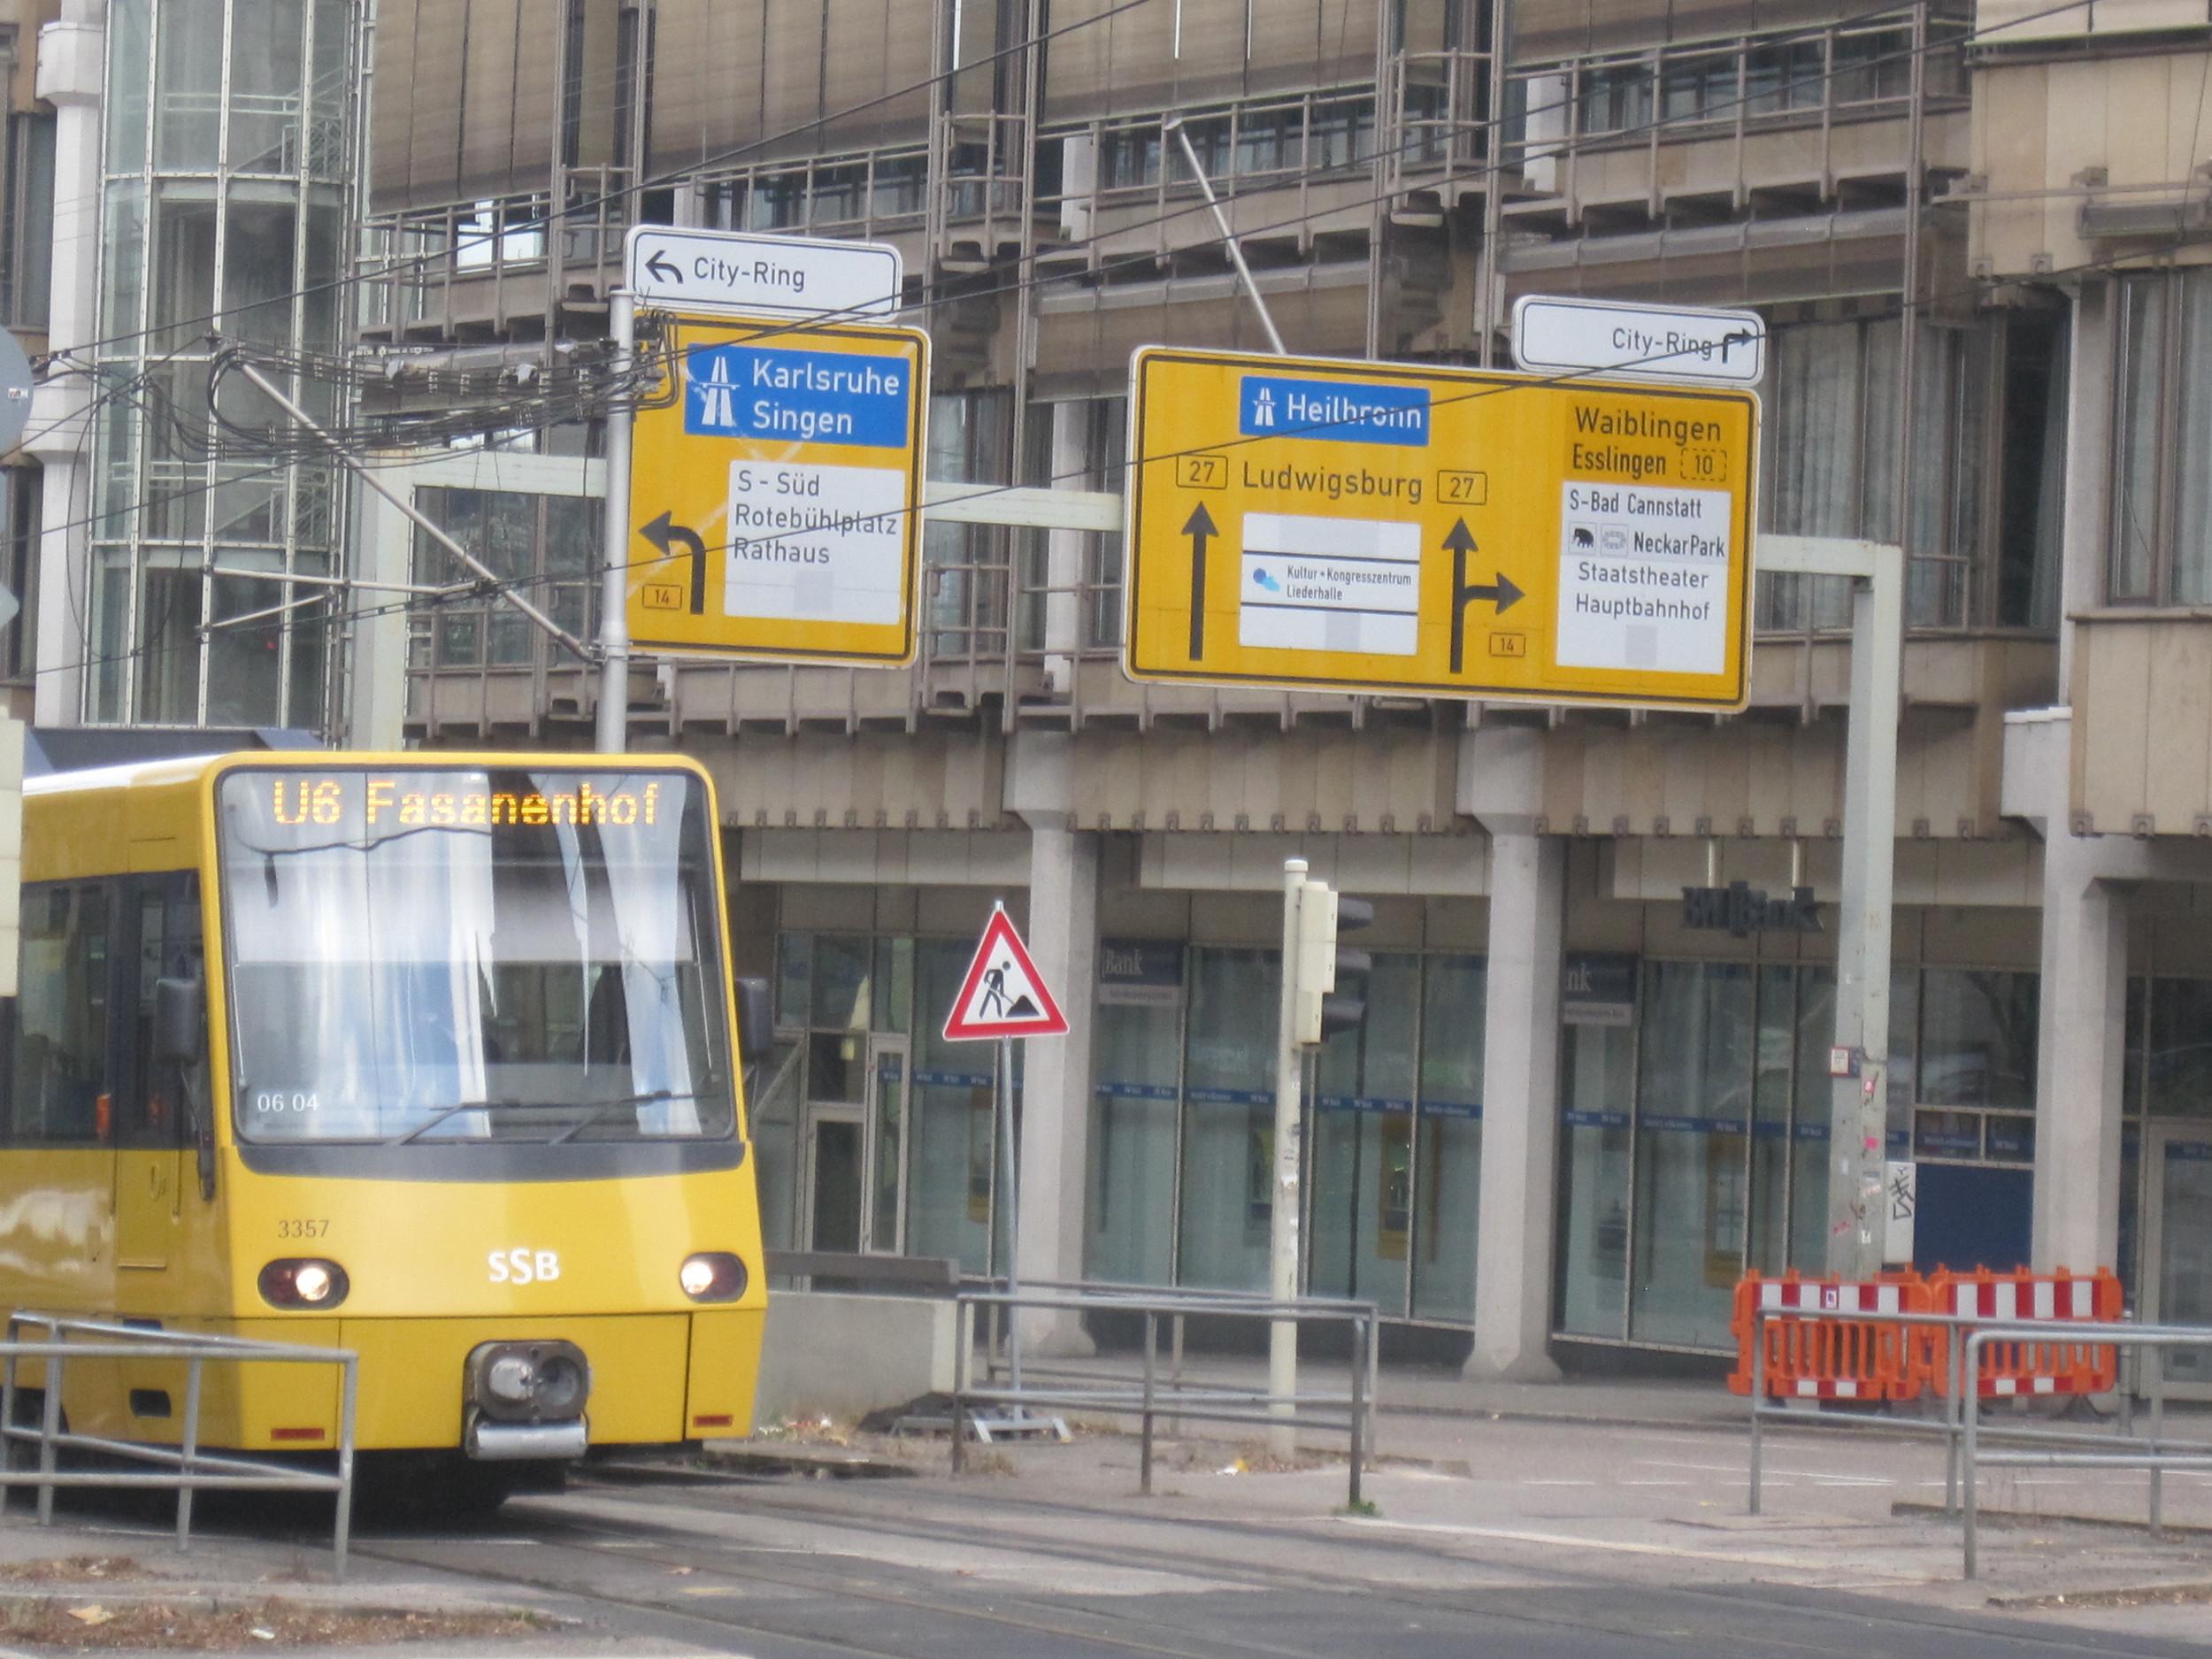 Stuttgart's light rail (SSB) receives signal prioritization at all intersections across the region.   (photo:    roger skalbeck   )